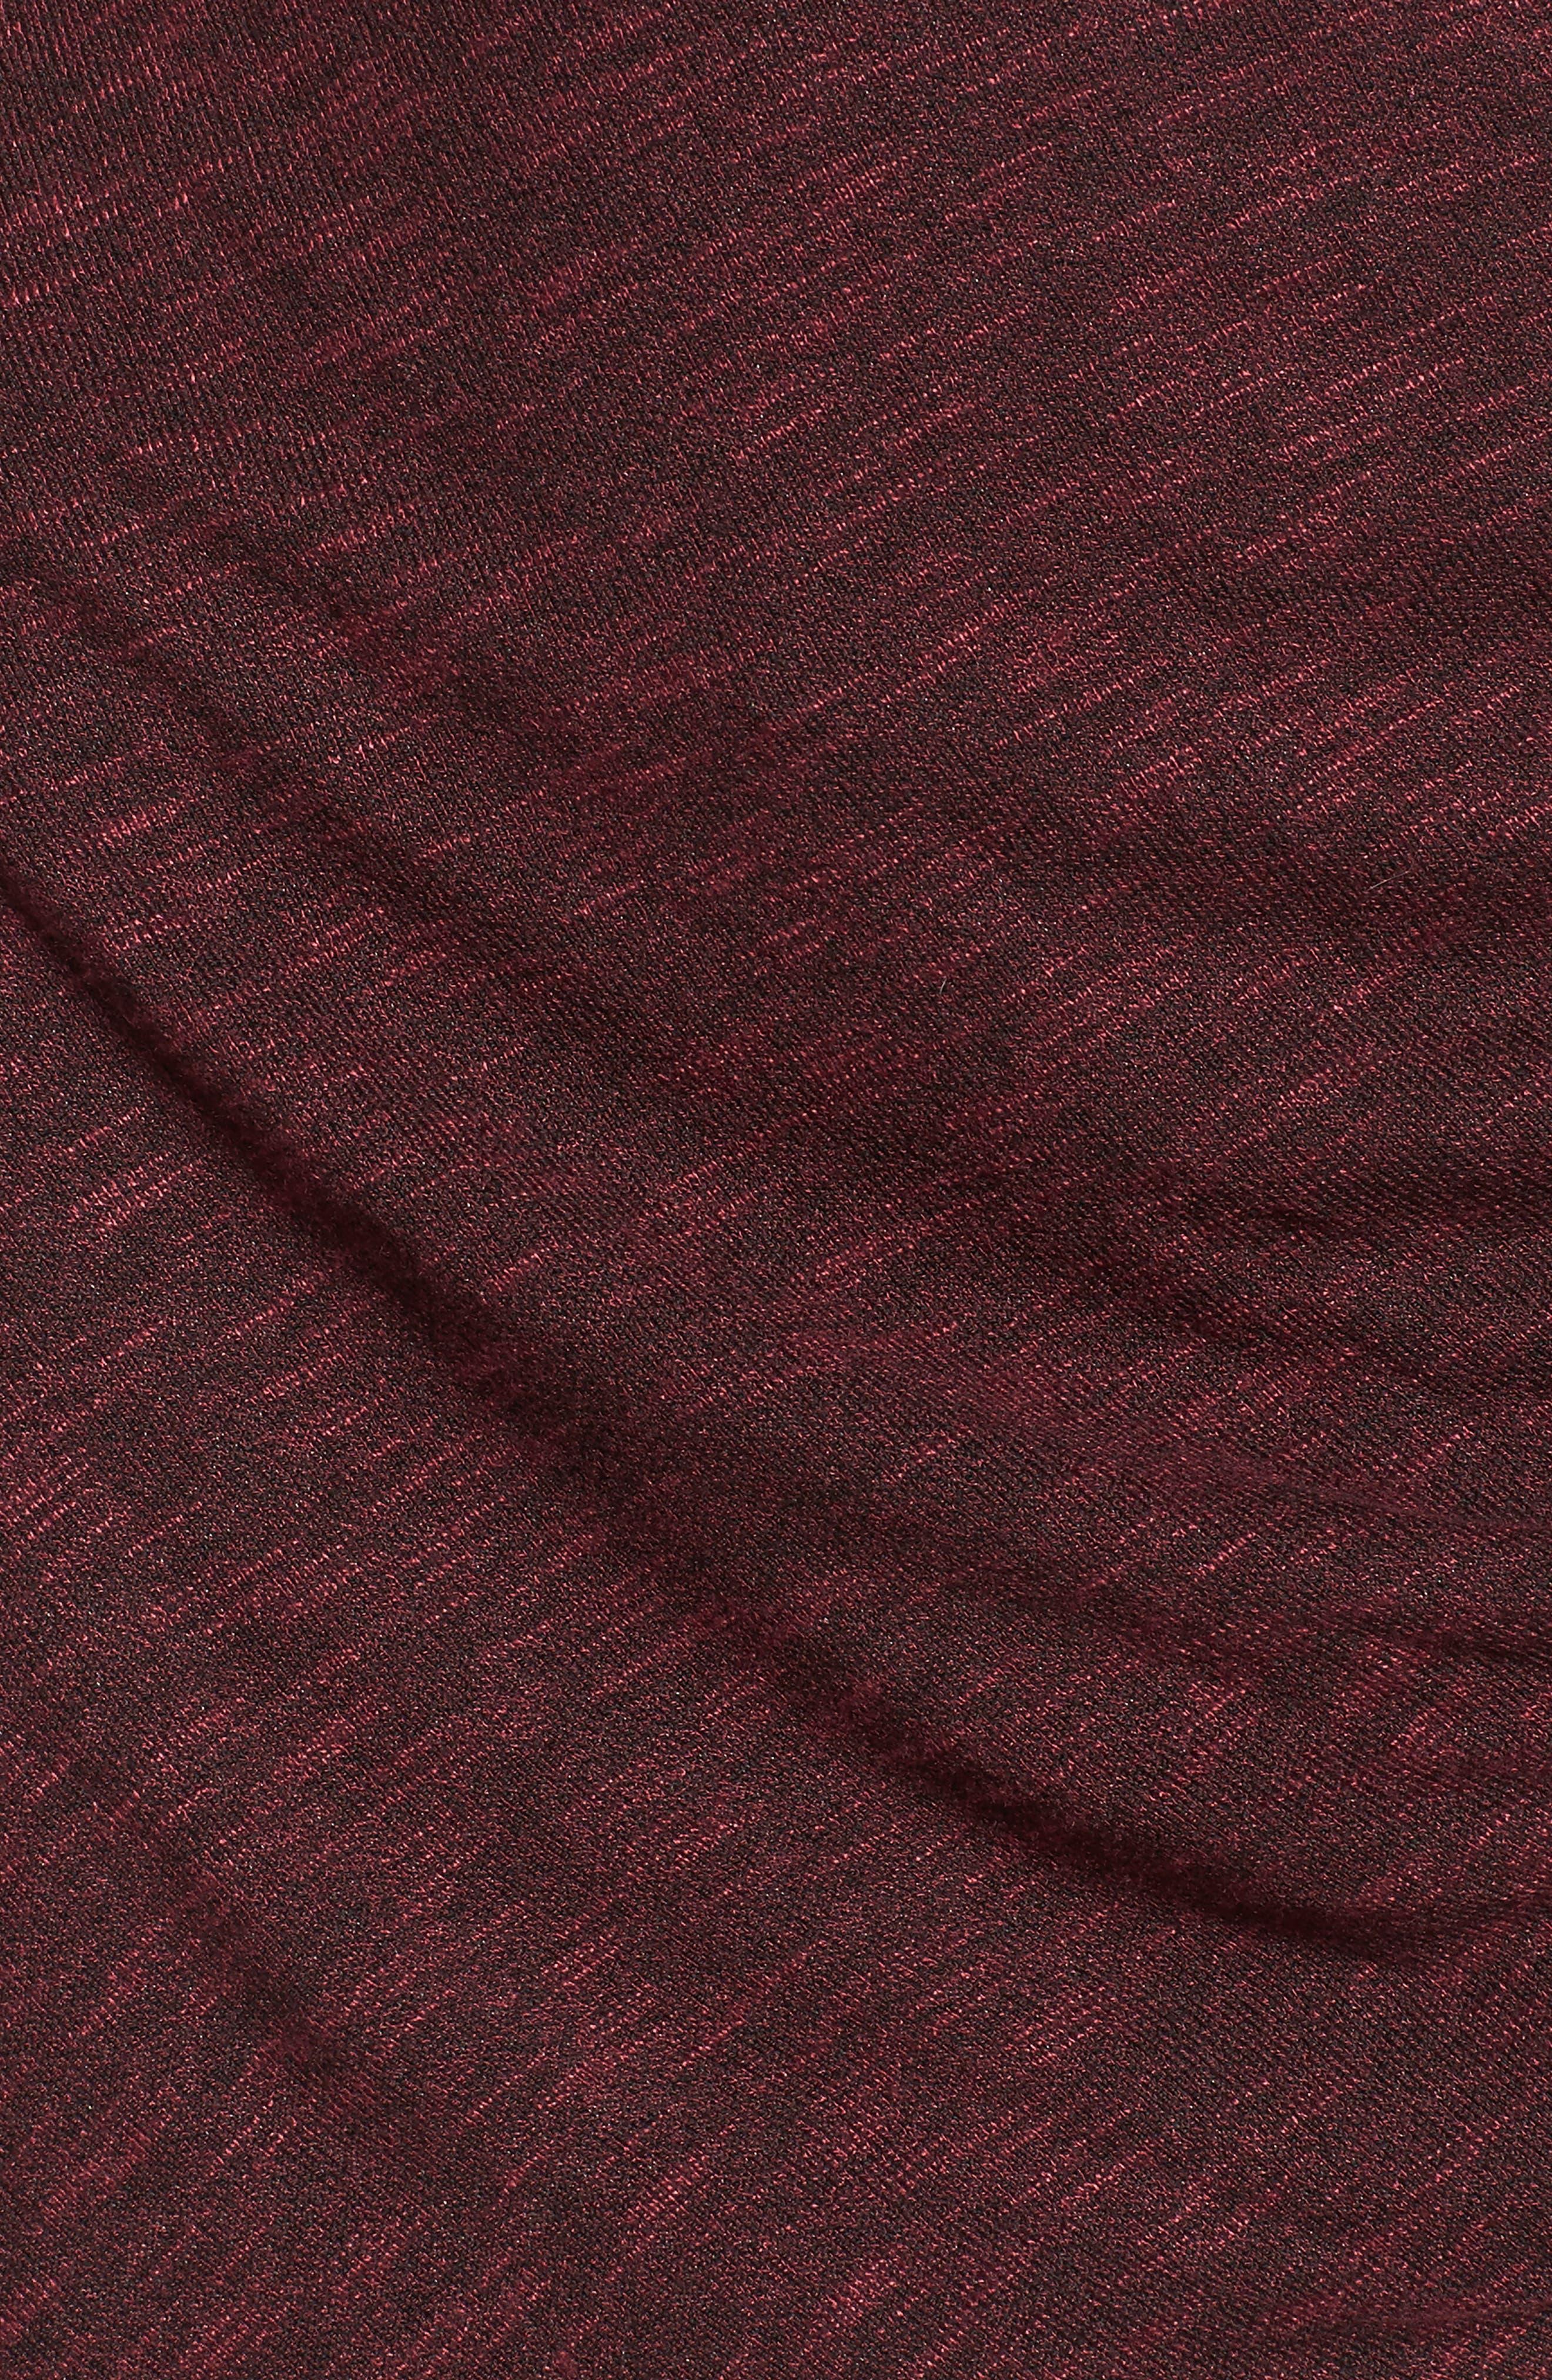 Ruched Knit Dress,                             Alternate thumbnail 5, color,                             Zinfandel